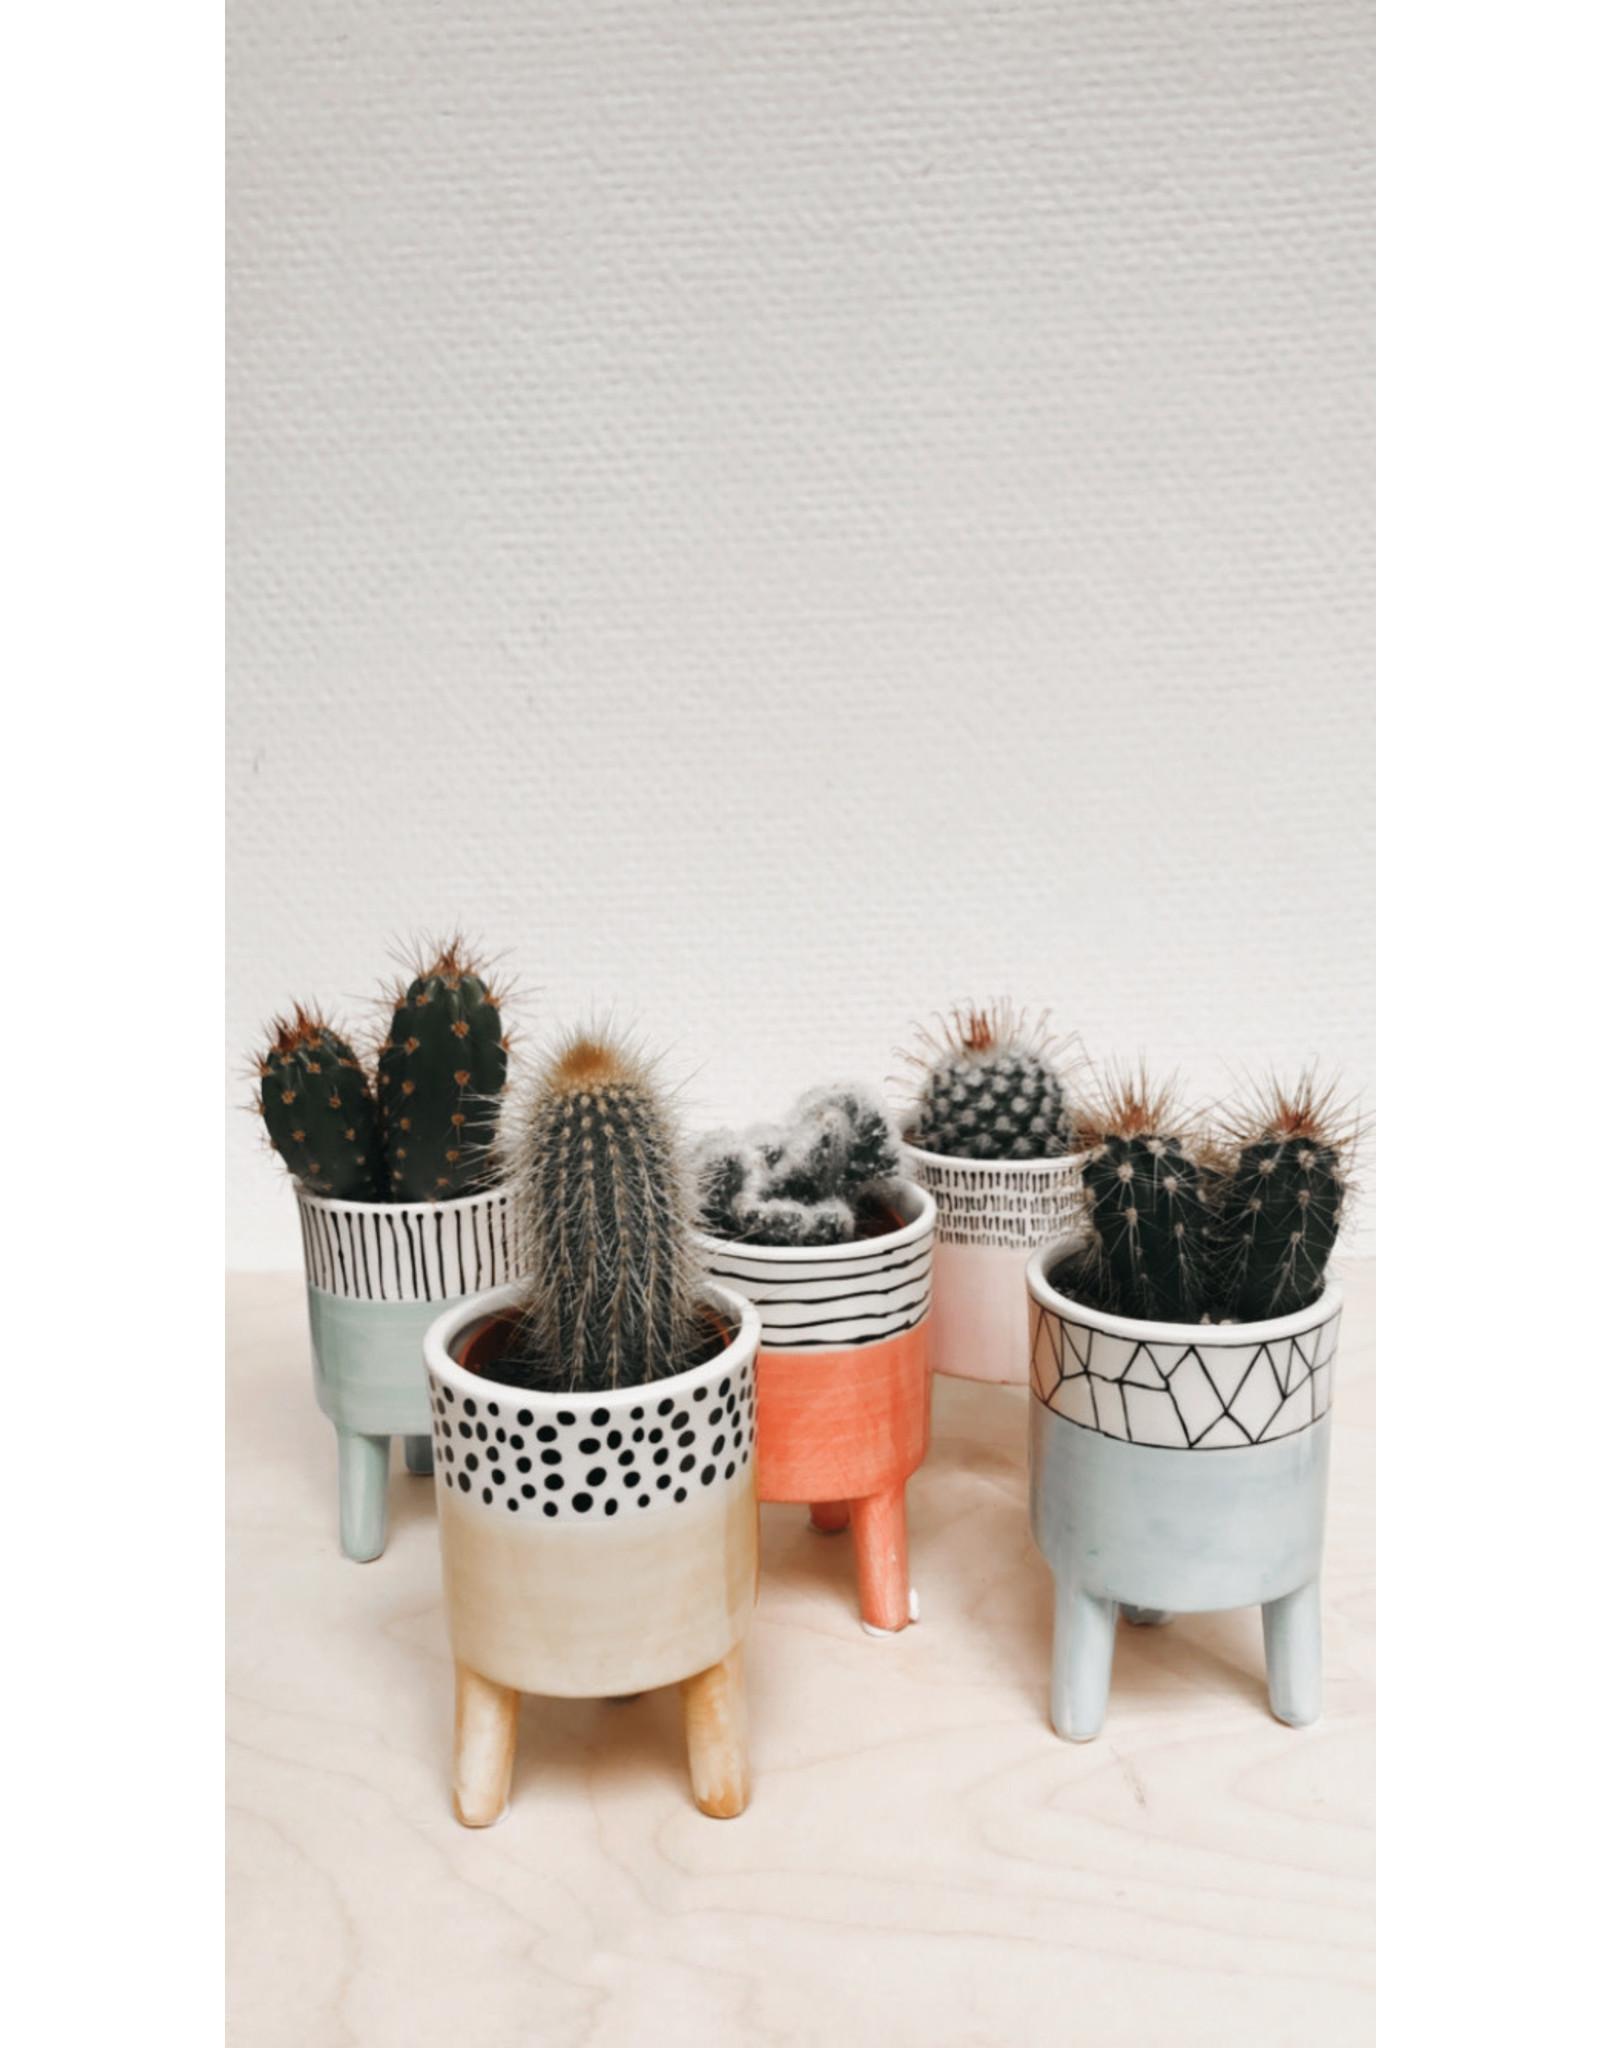 Plantophile Bloempotje 3 pootjes - Oranje & Horizontale lijntjes - Ø 6,5 x H 10 cm